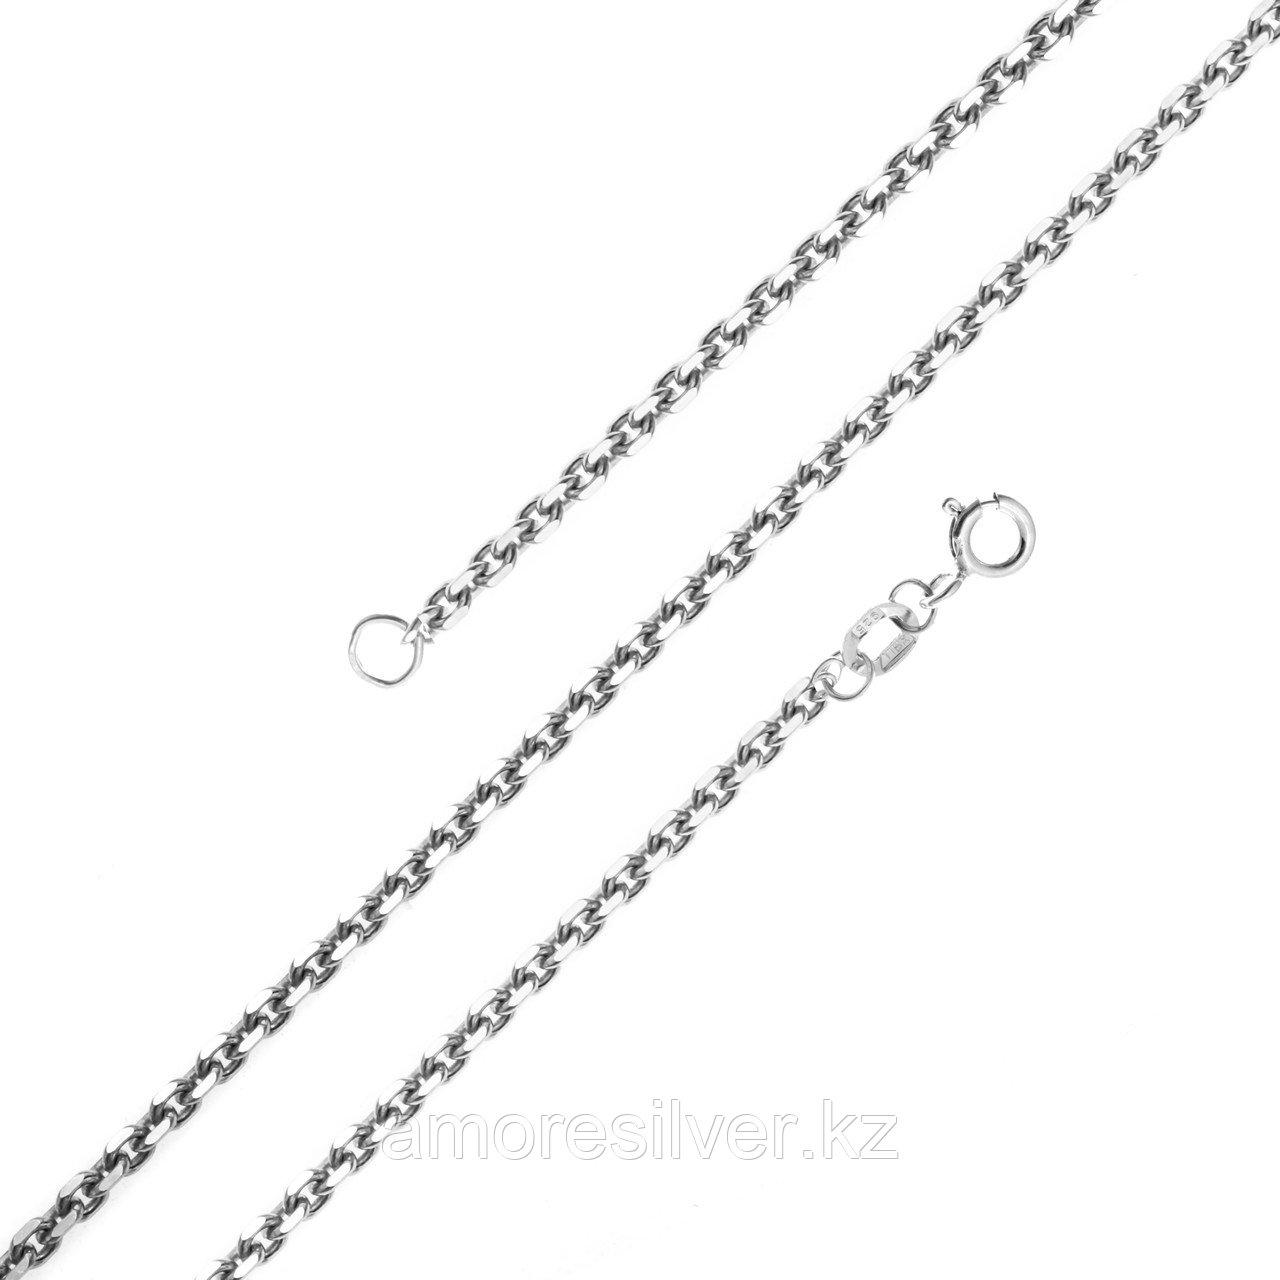 Цепь Красцветмет серебро с родием, без вставок, якорная НЦ 22-053-3-030 размеры - 40 45 50